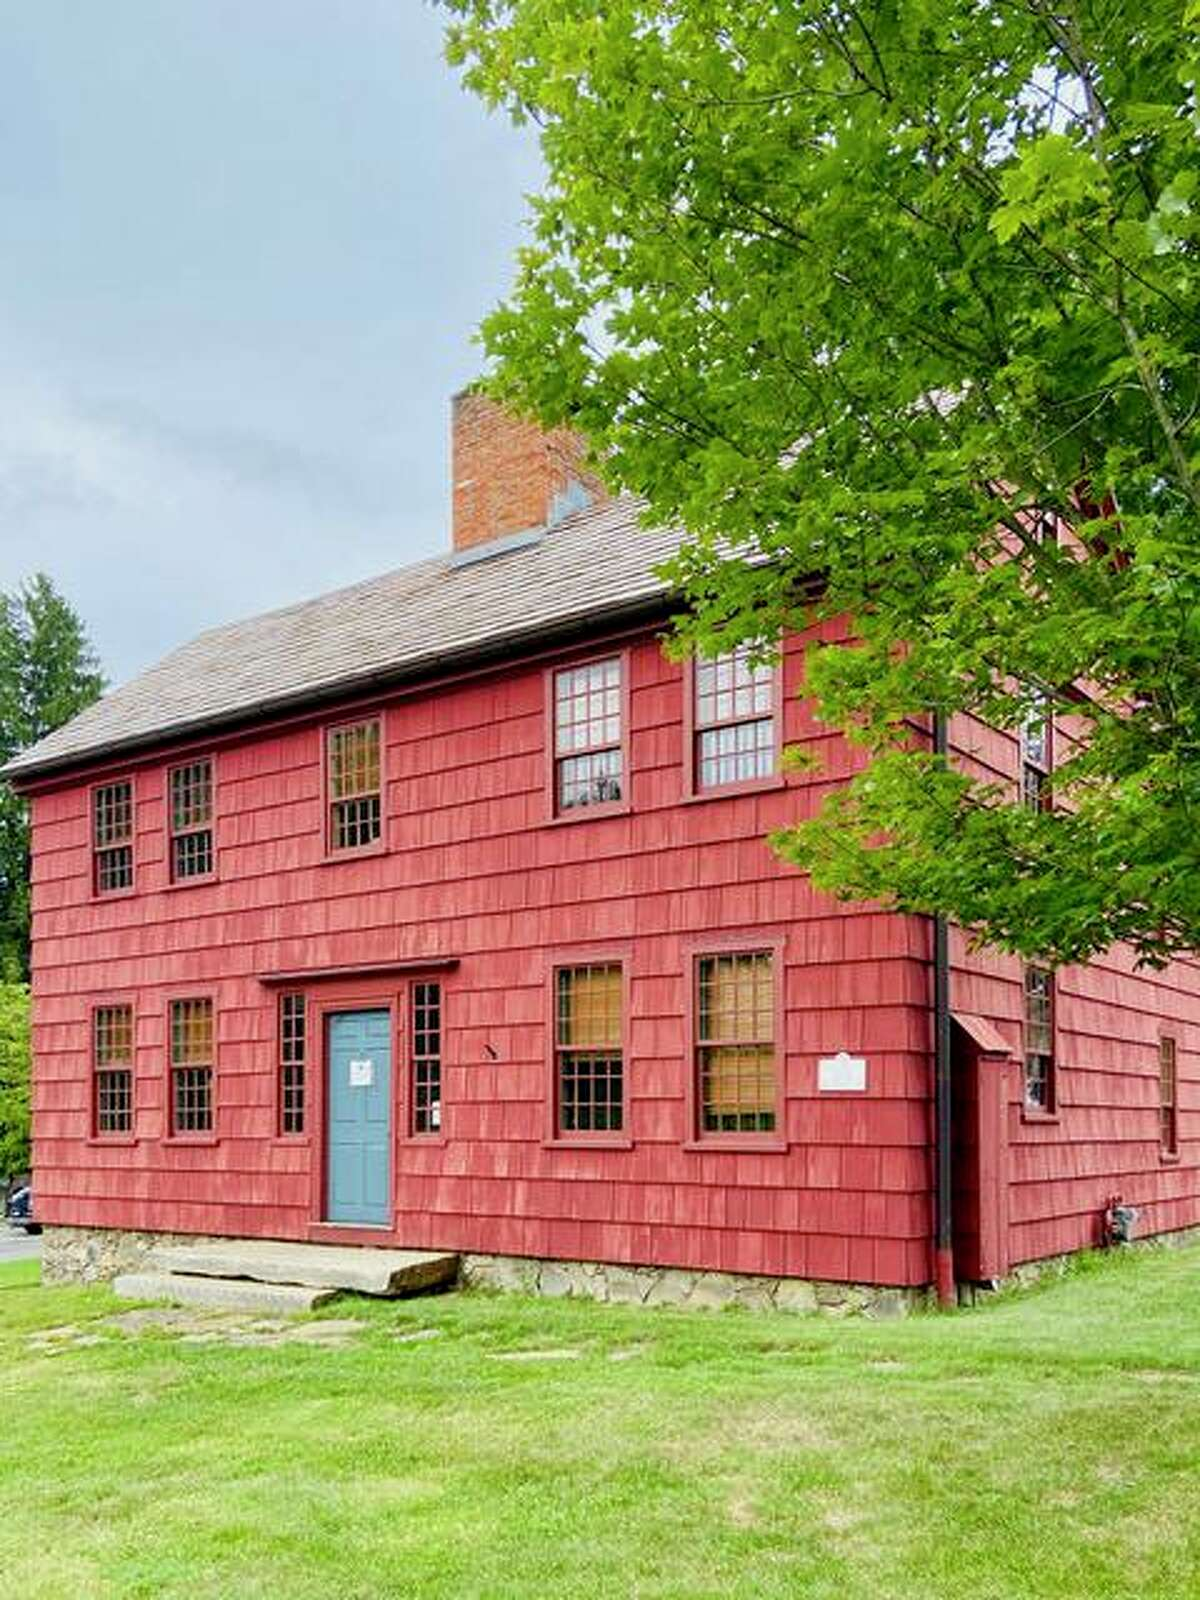 Scott House, the headquarters of the Ridgefield Historical Society.